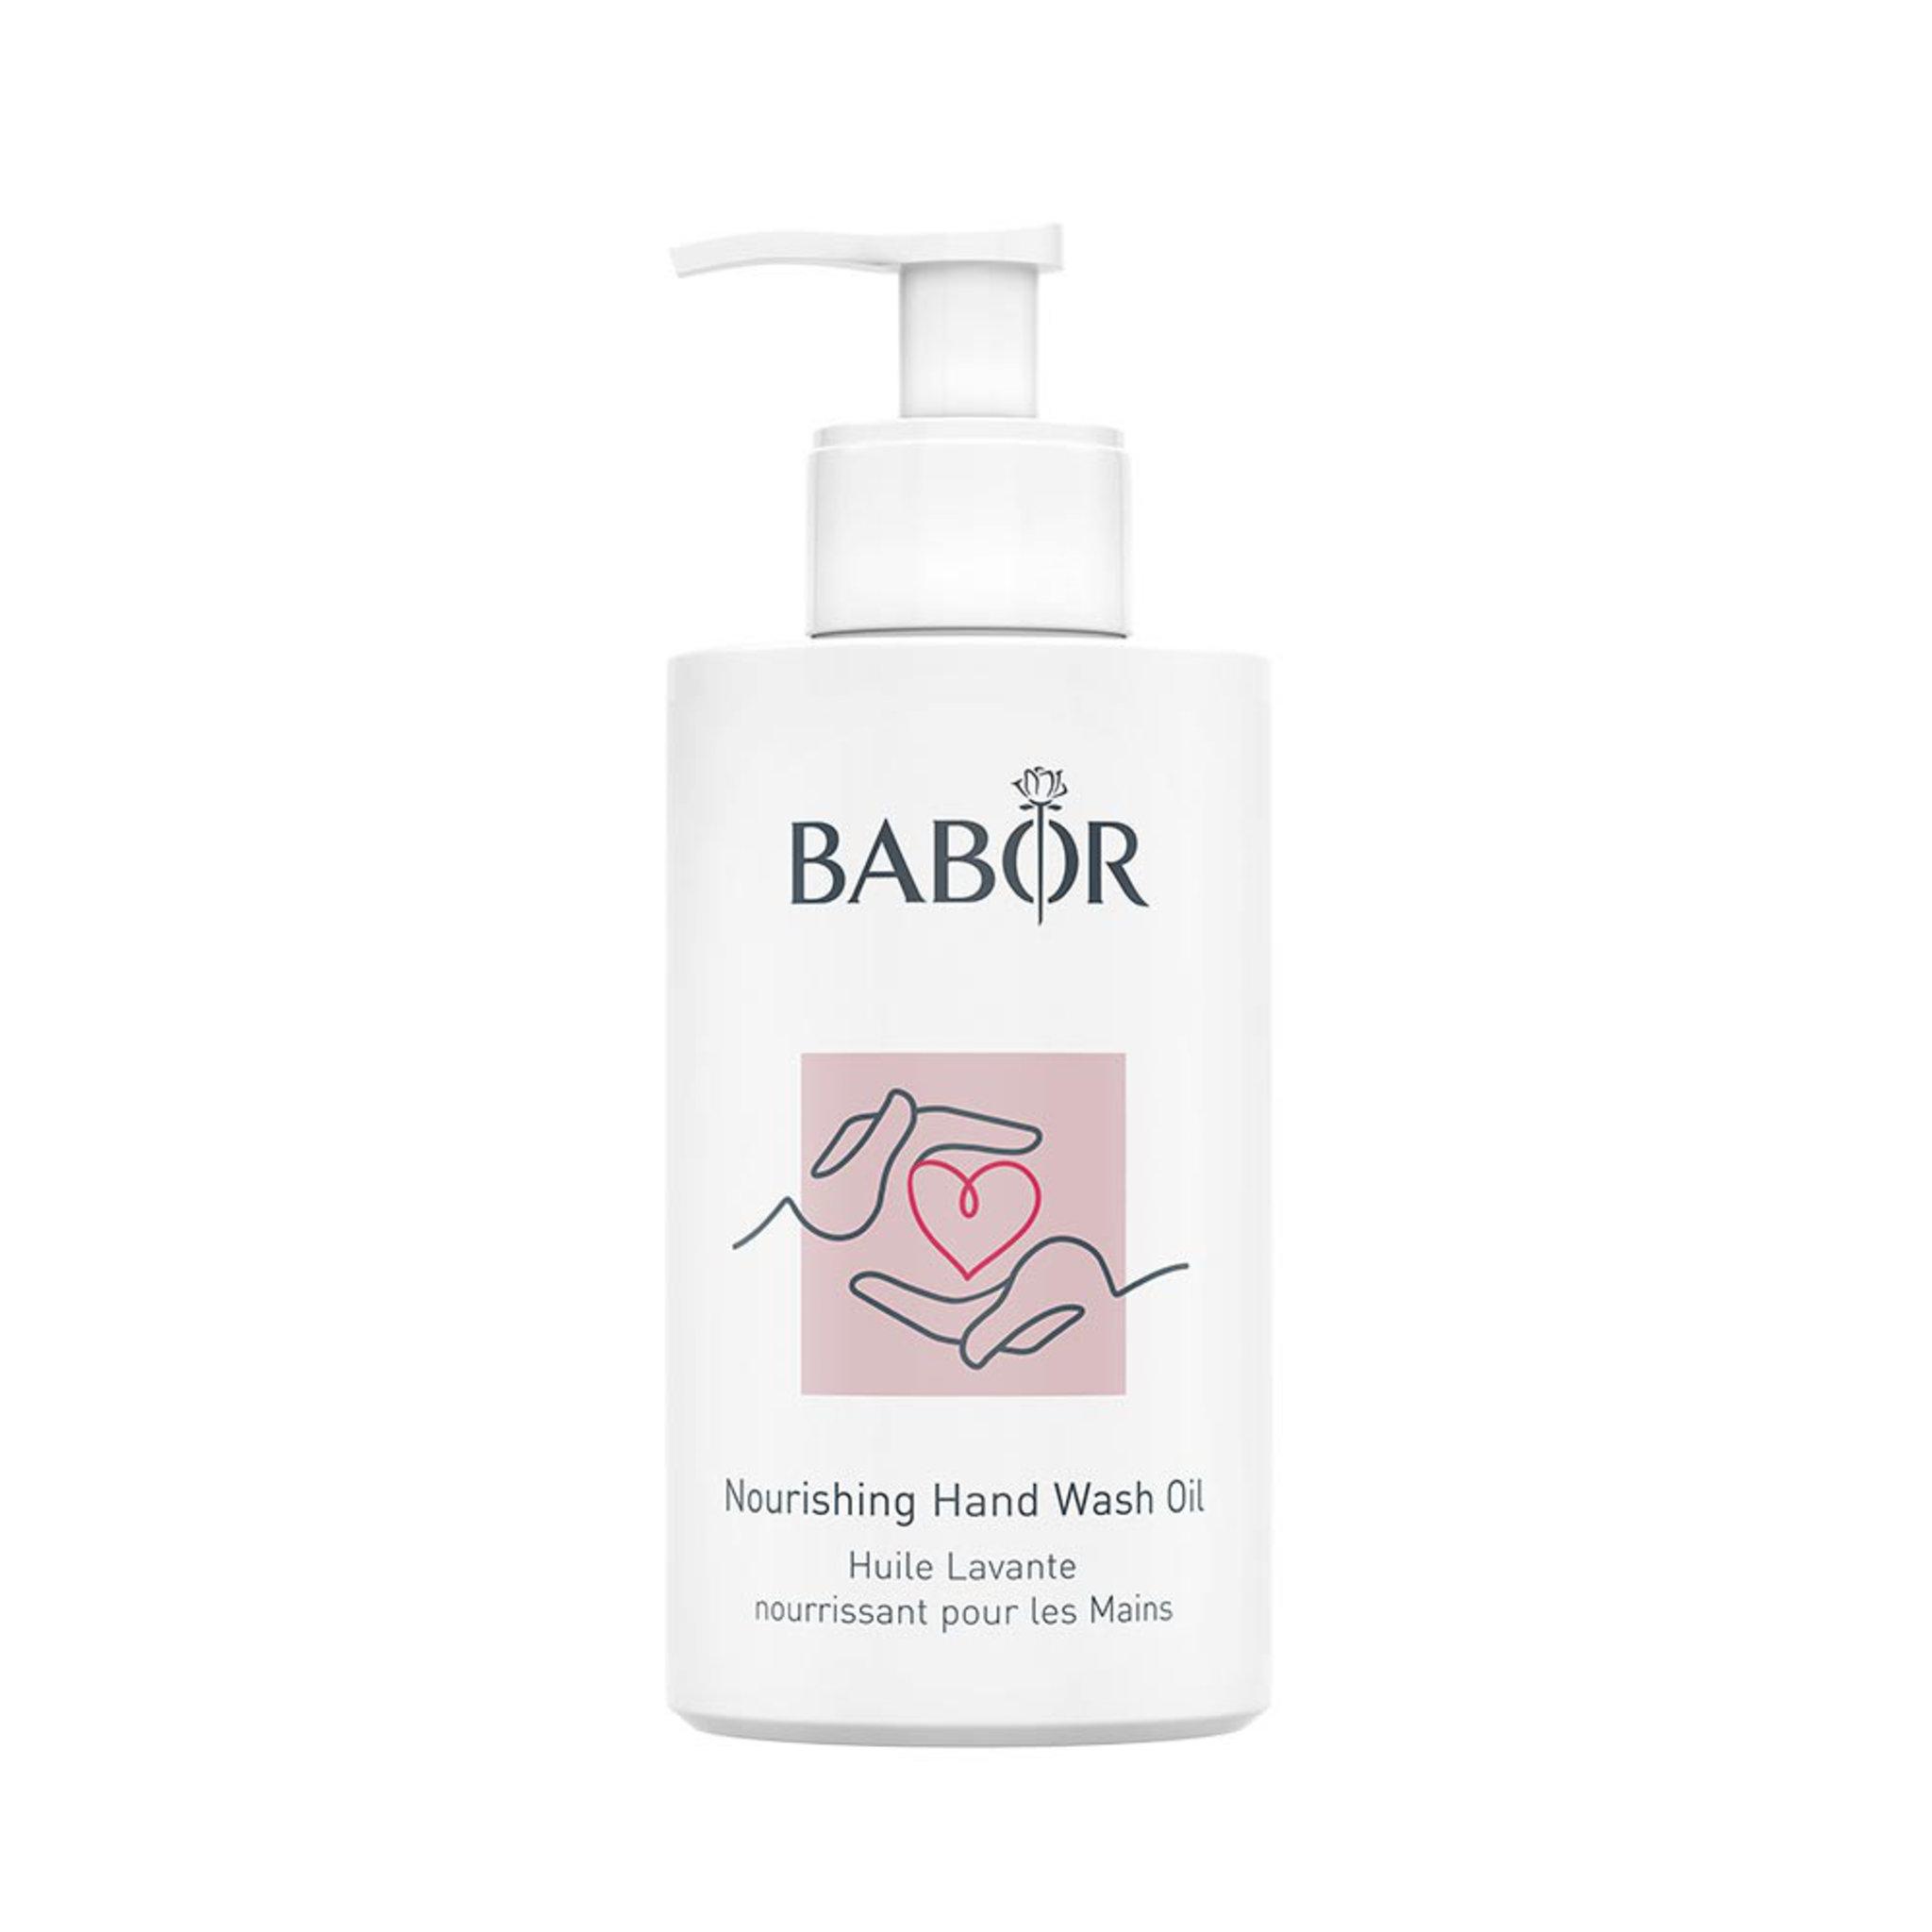 Nourishing Hand Wash Oil, 100 ml